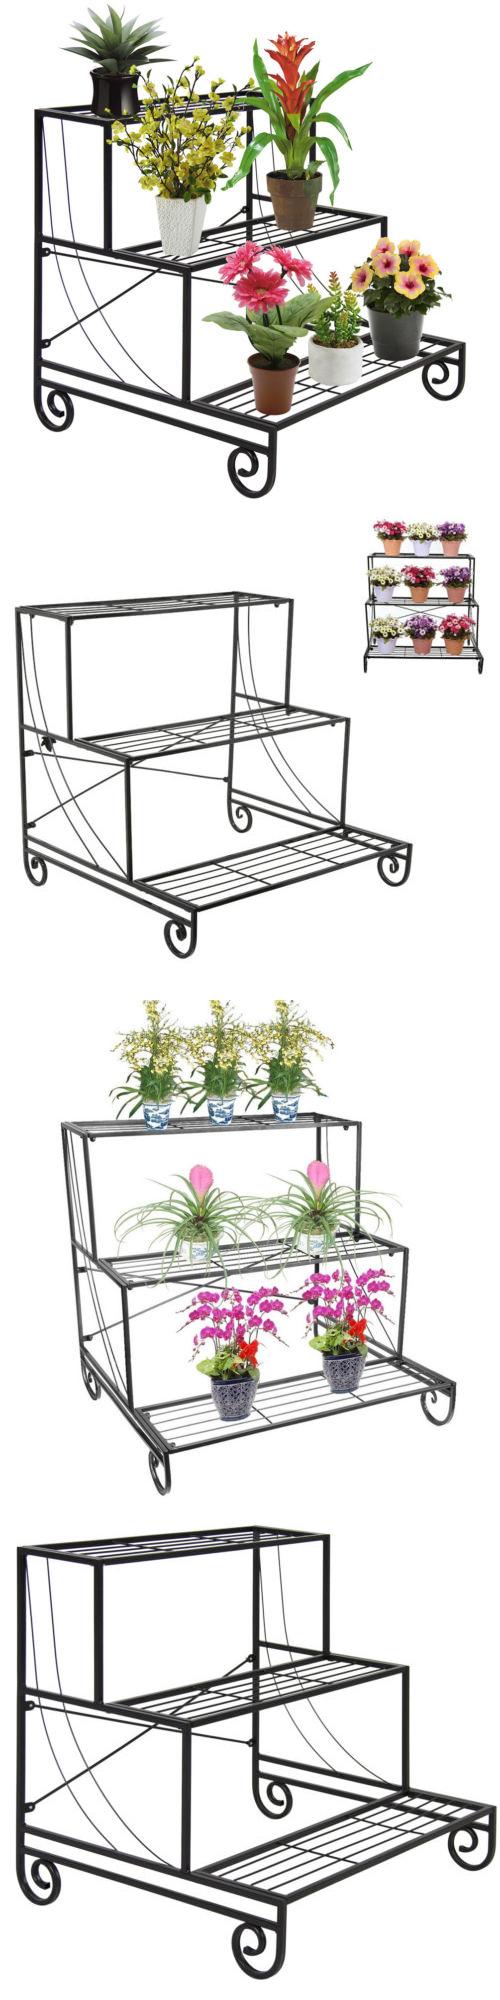 Plant Stands 29514: 3 Tier Metal Plant Stand Decorative Planter Holder  Flower Pot Shelf Rack